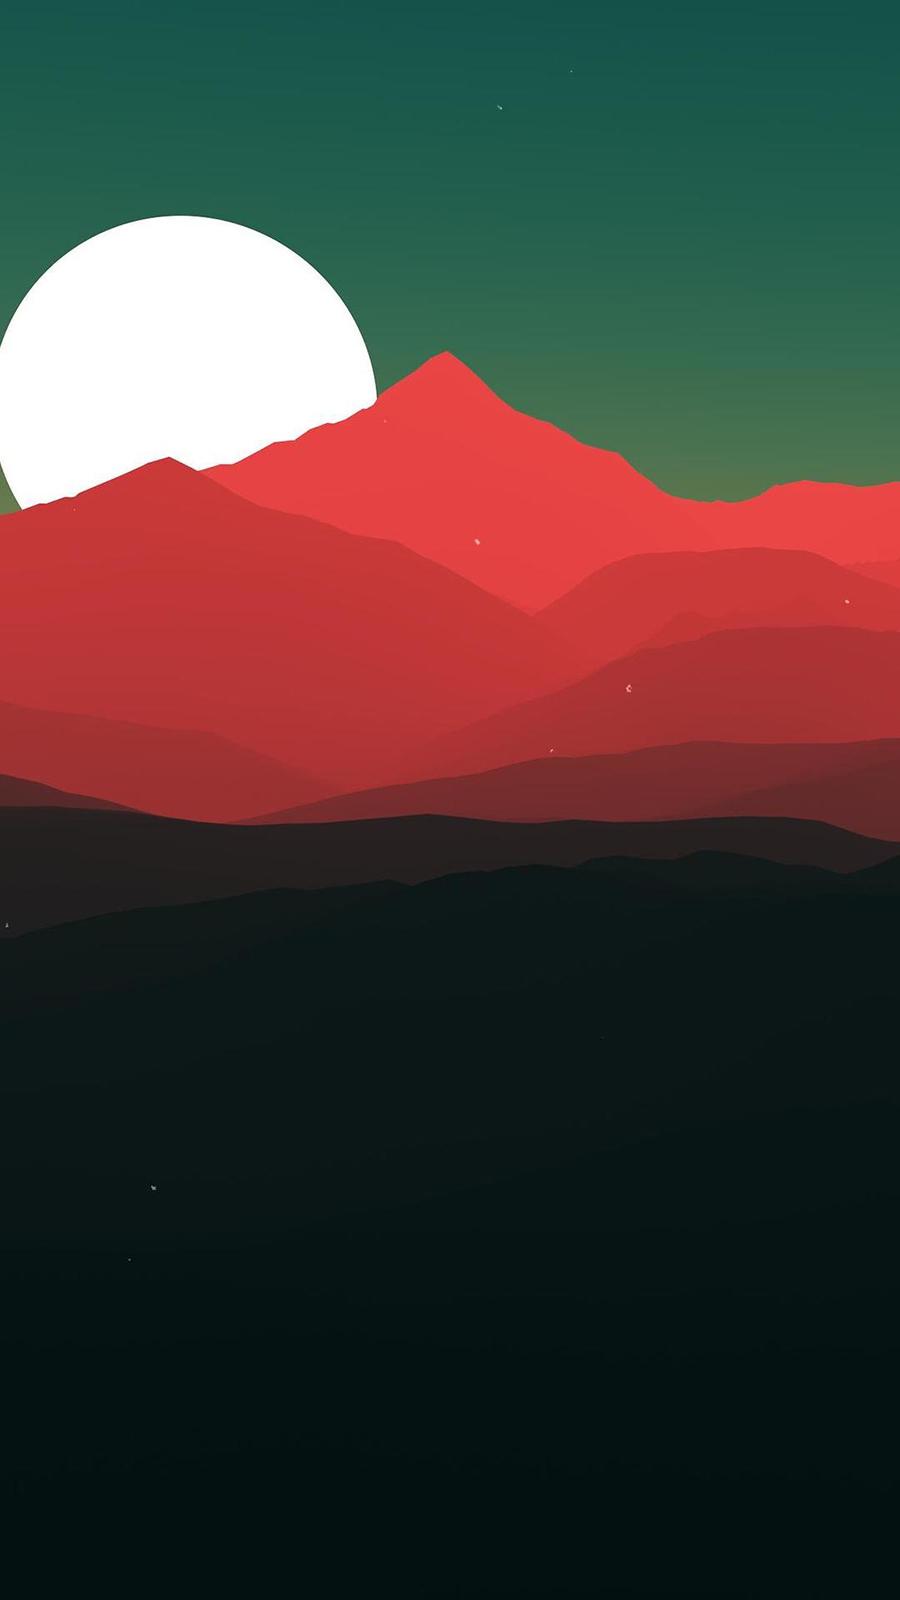 4K Art Full Moon Wallpapers Free Download